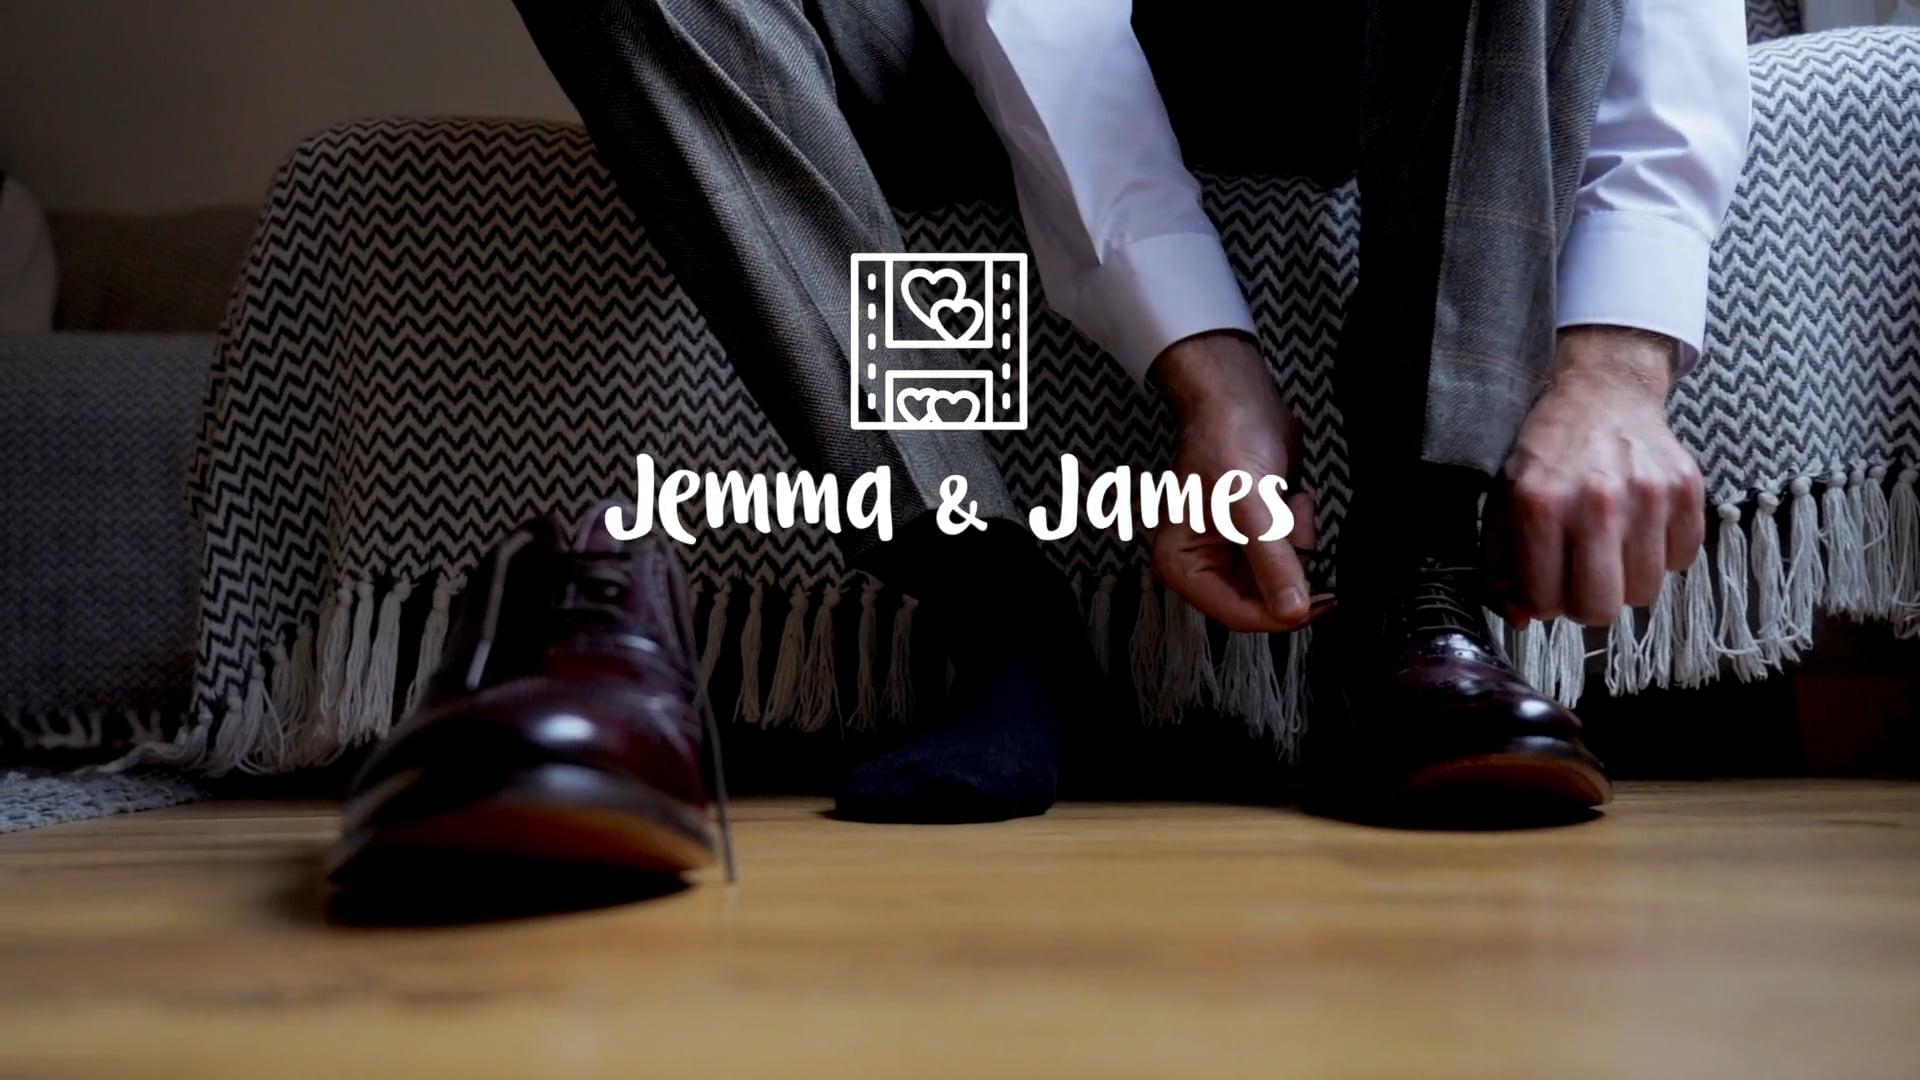 Jemma & James Instagram Film